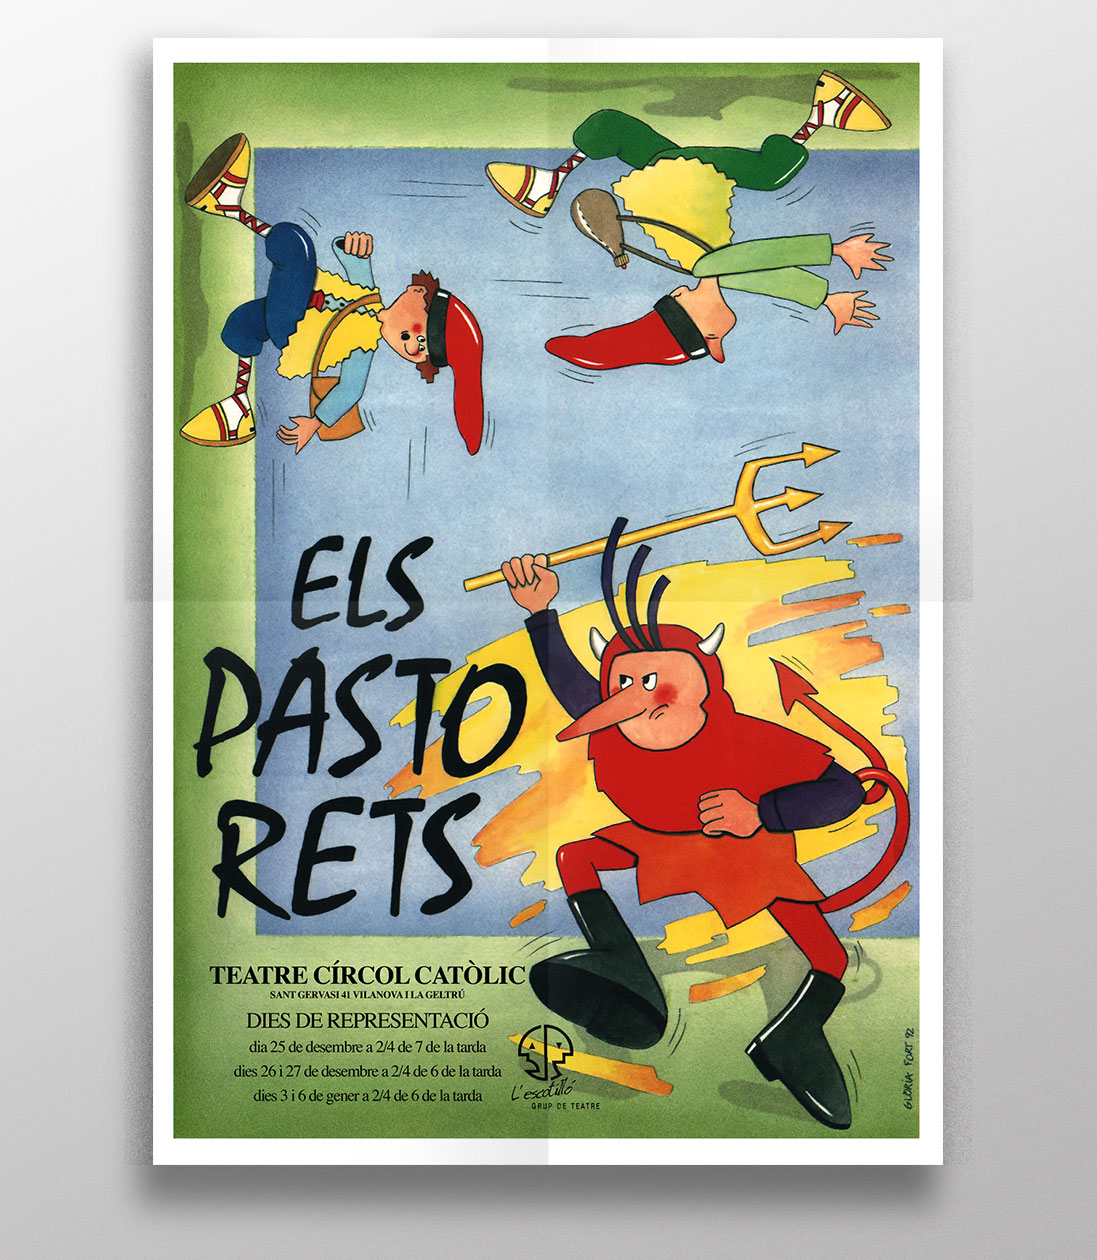 poster-pastorets